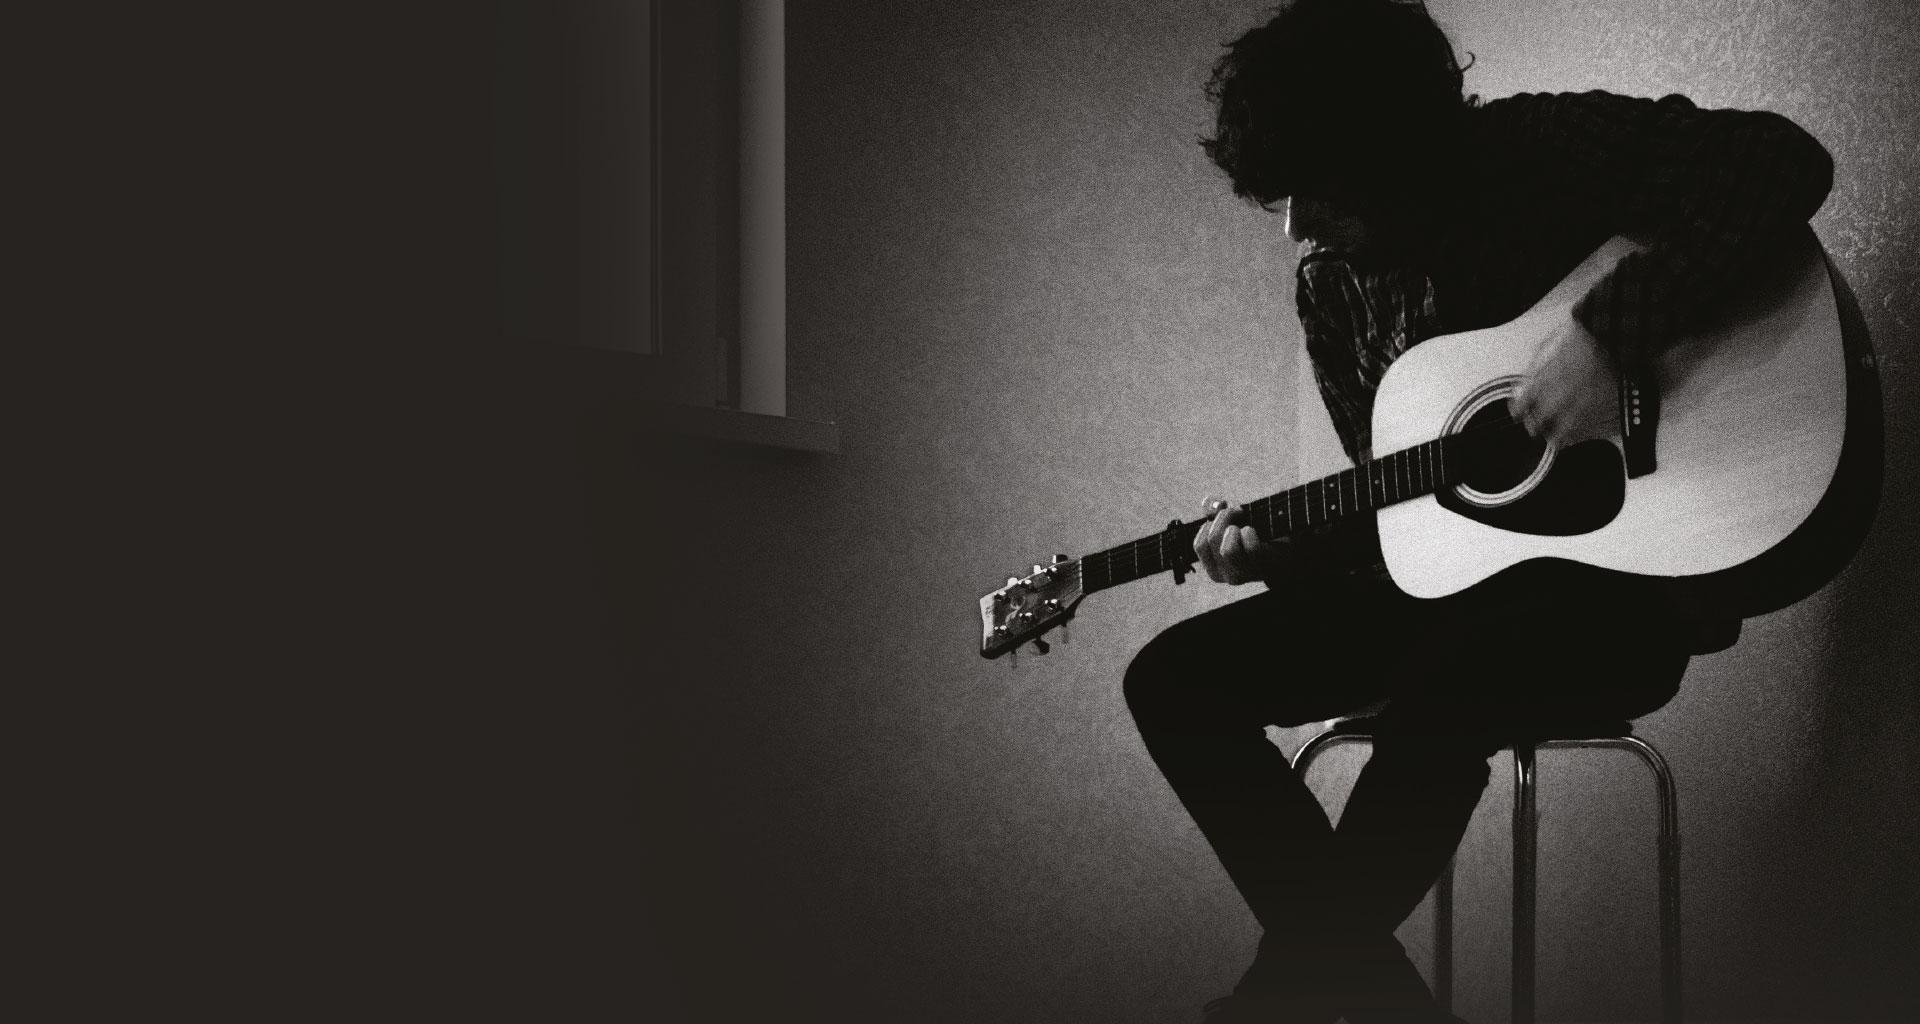 Music on Guitar